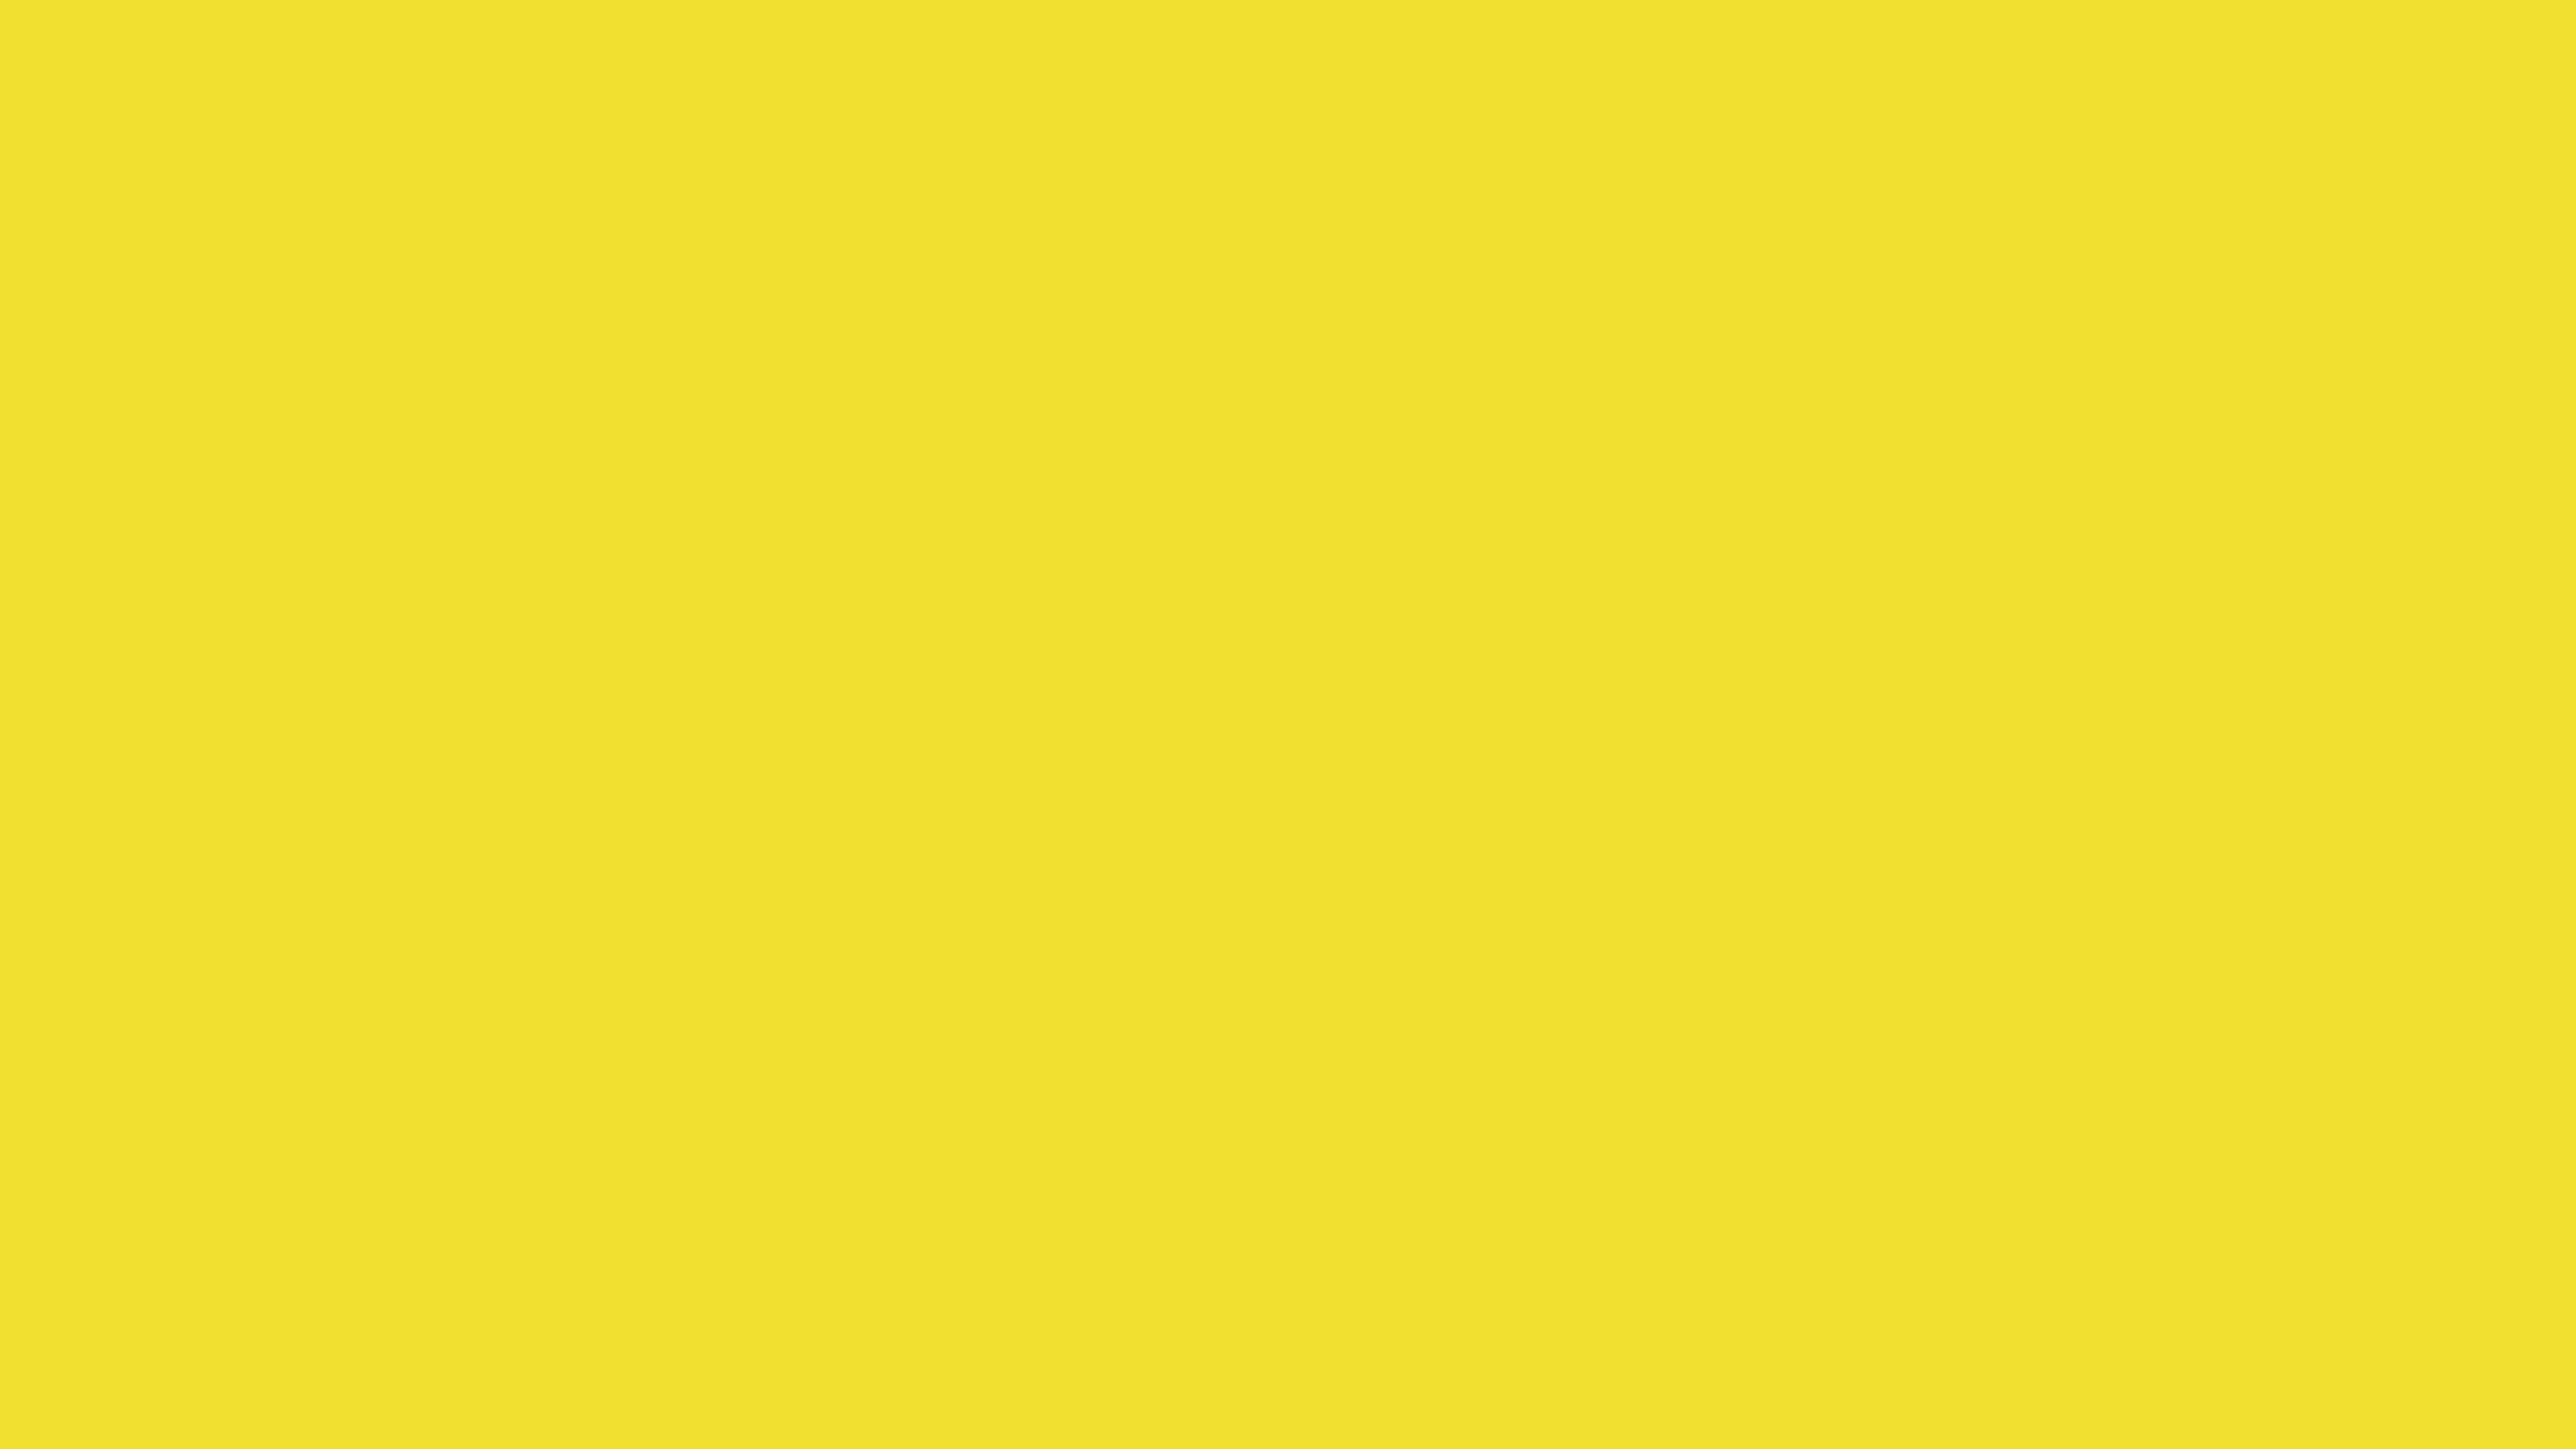 3840x2160 Dandelion Solid Color Background